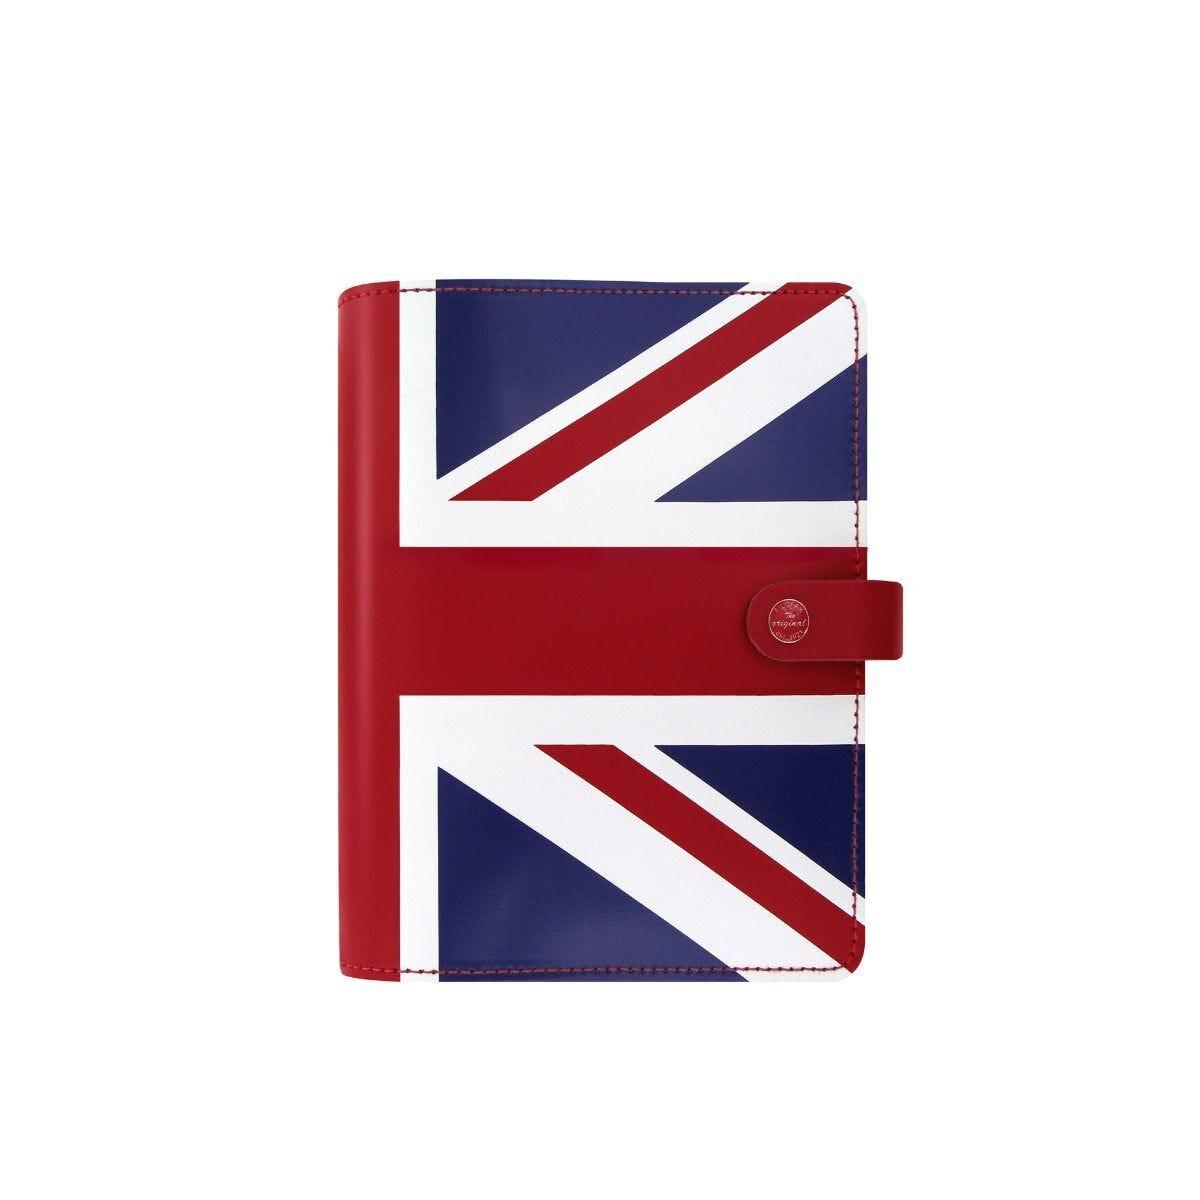 Filofax A5 Original Union Jack Organiser